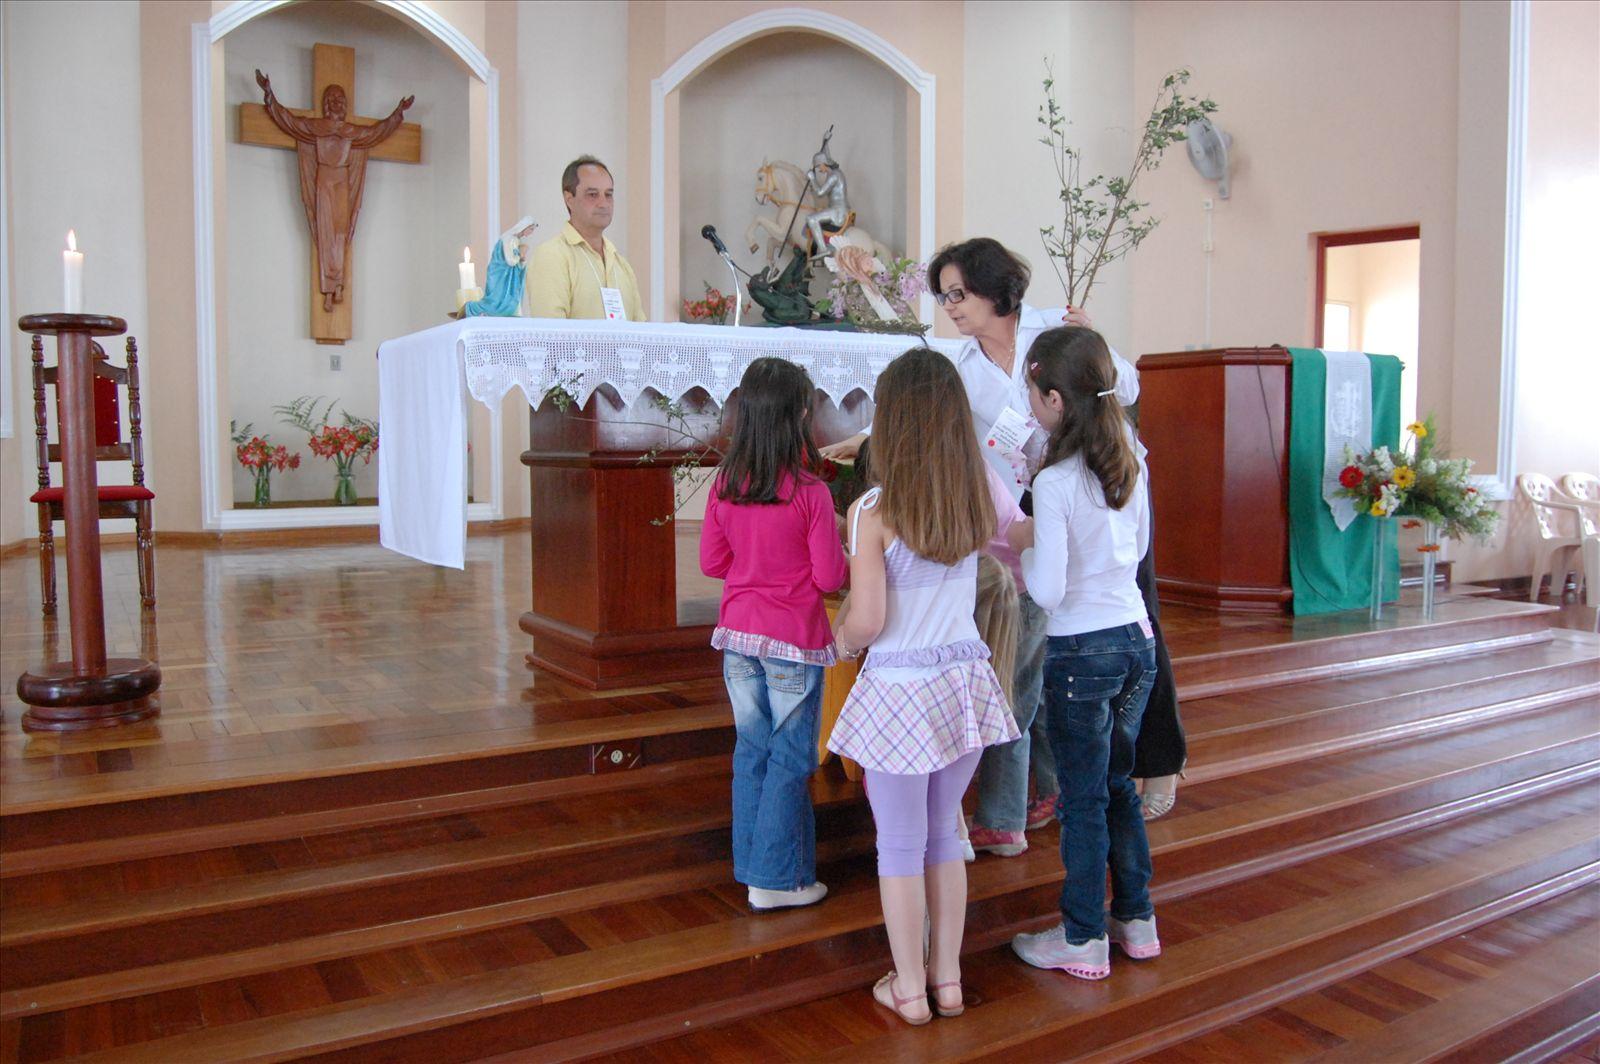 2º Encontro Família Cornelli - 11.10.2009 (132)_0